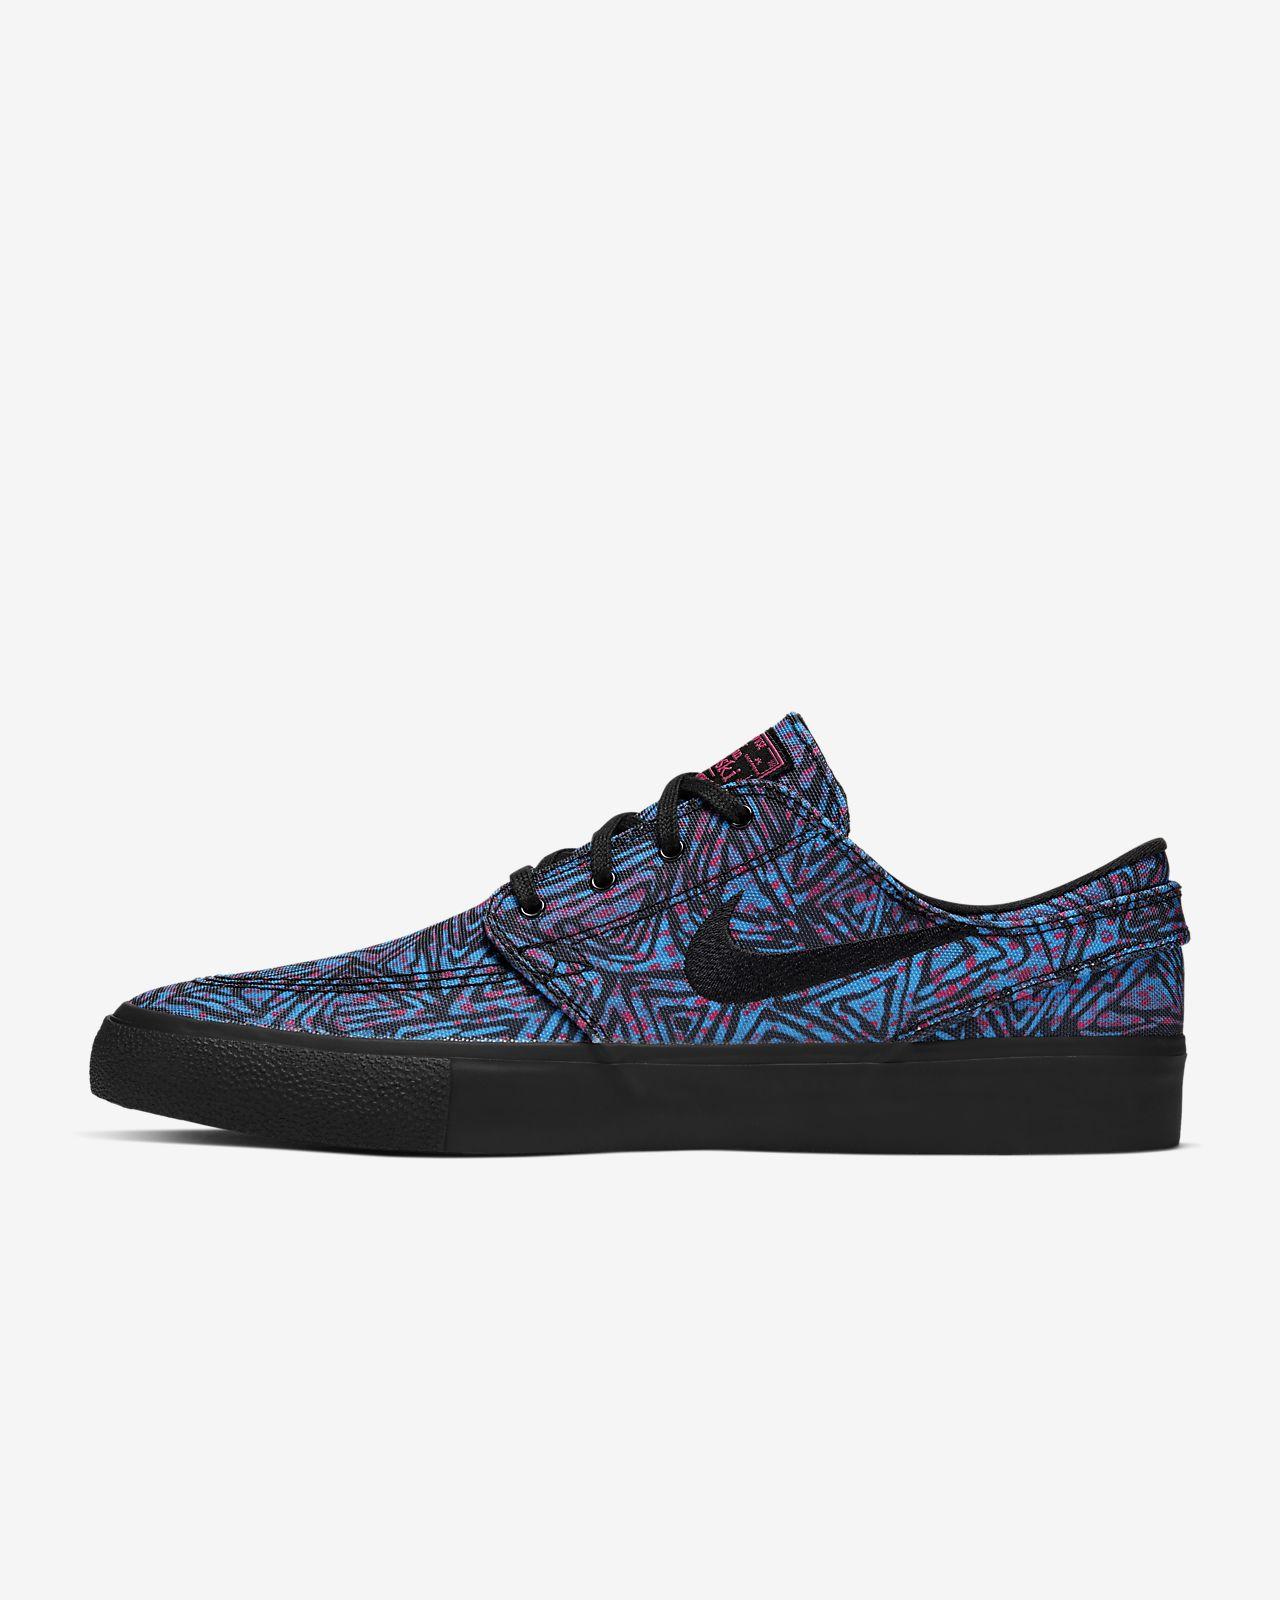 Nike SB Zoom Stefan Janoski Canvas RM Premium Skate Shoe